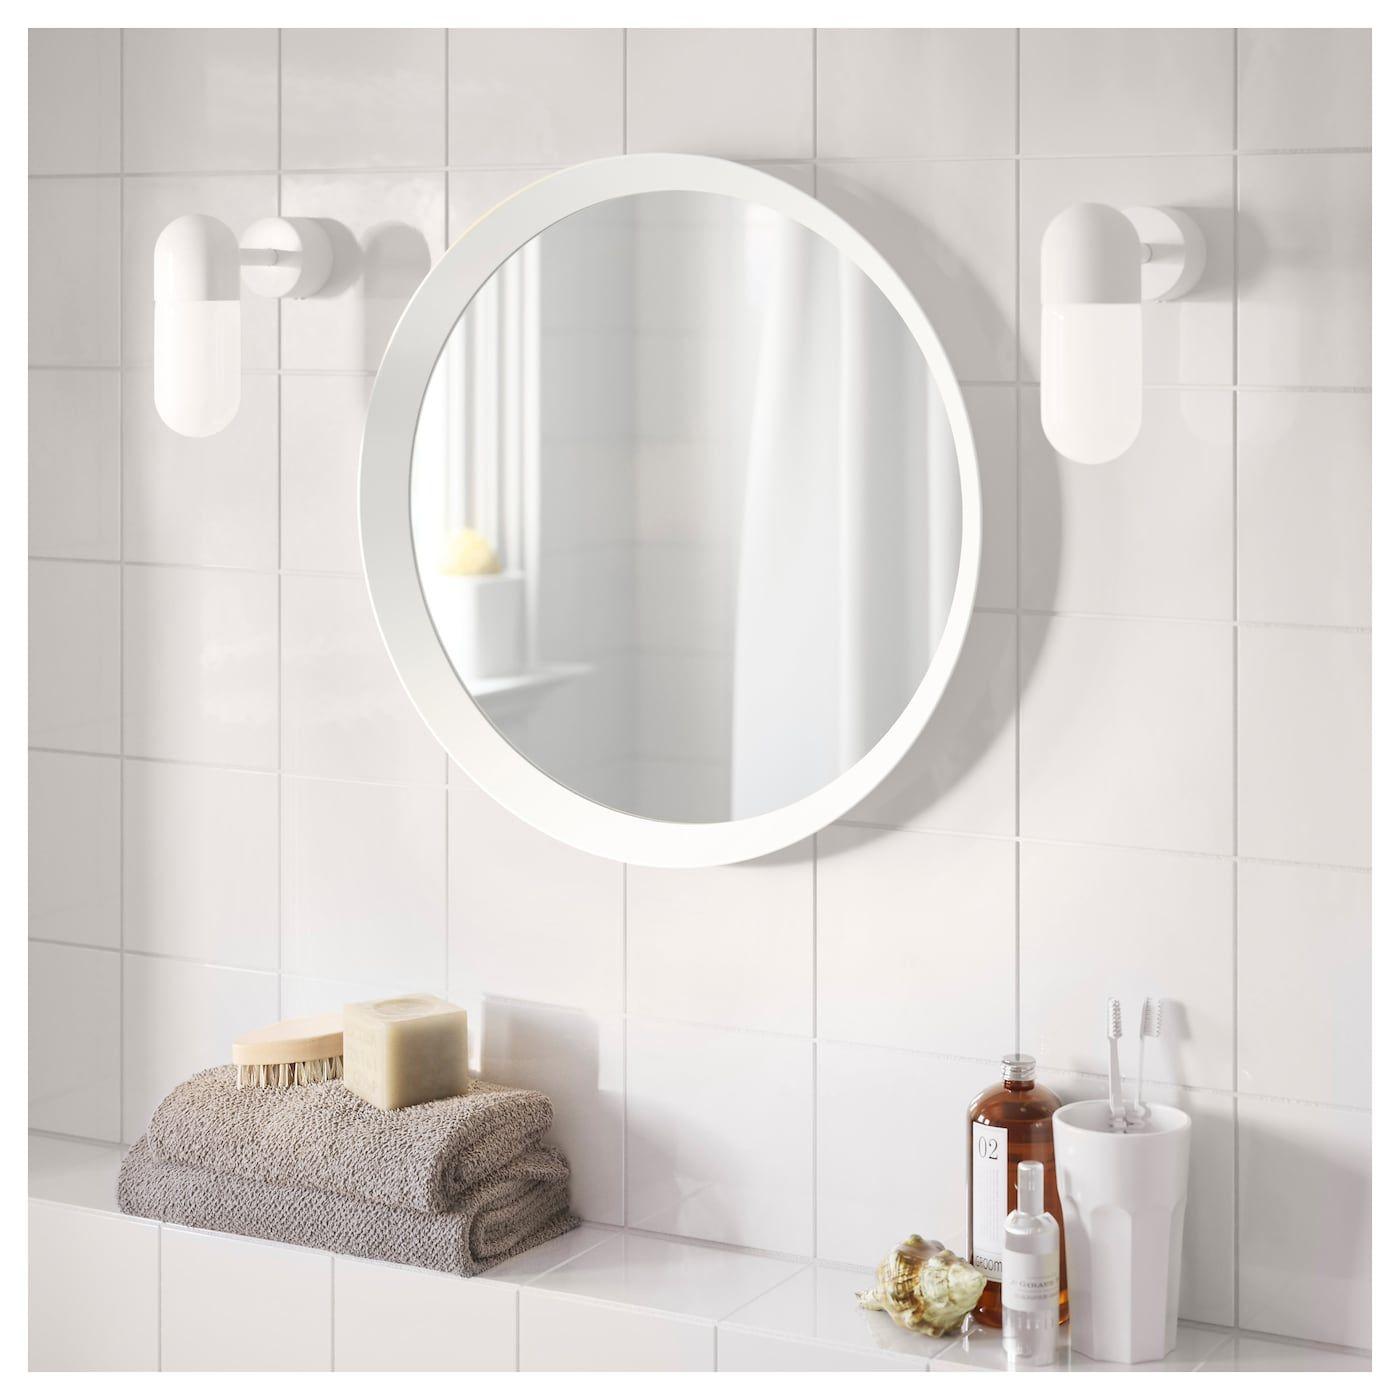 IKEA US - Furniture and Home Furnishings  Round mirror bathroom